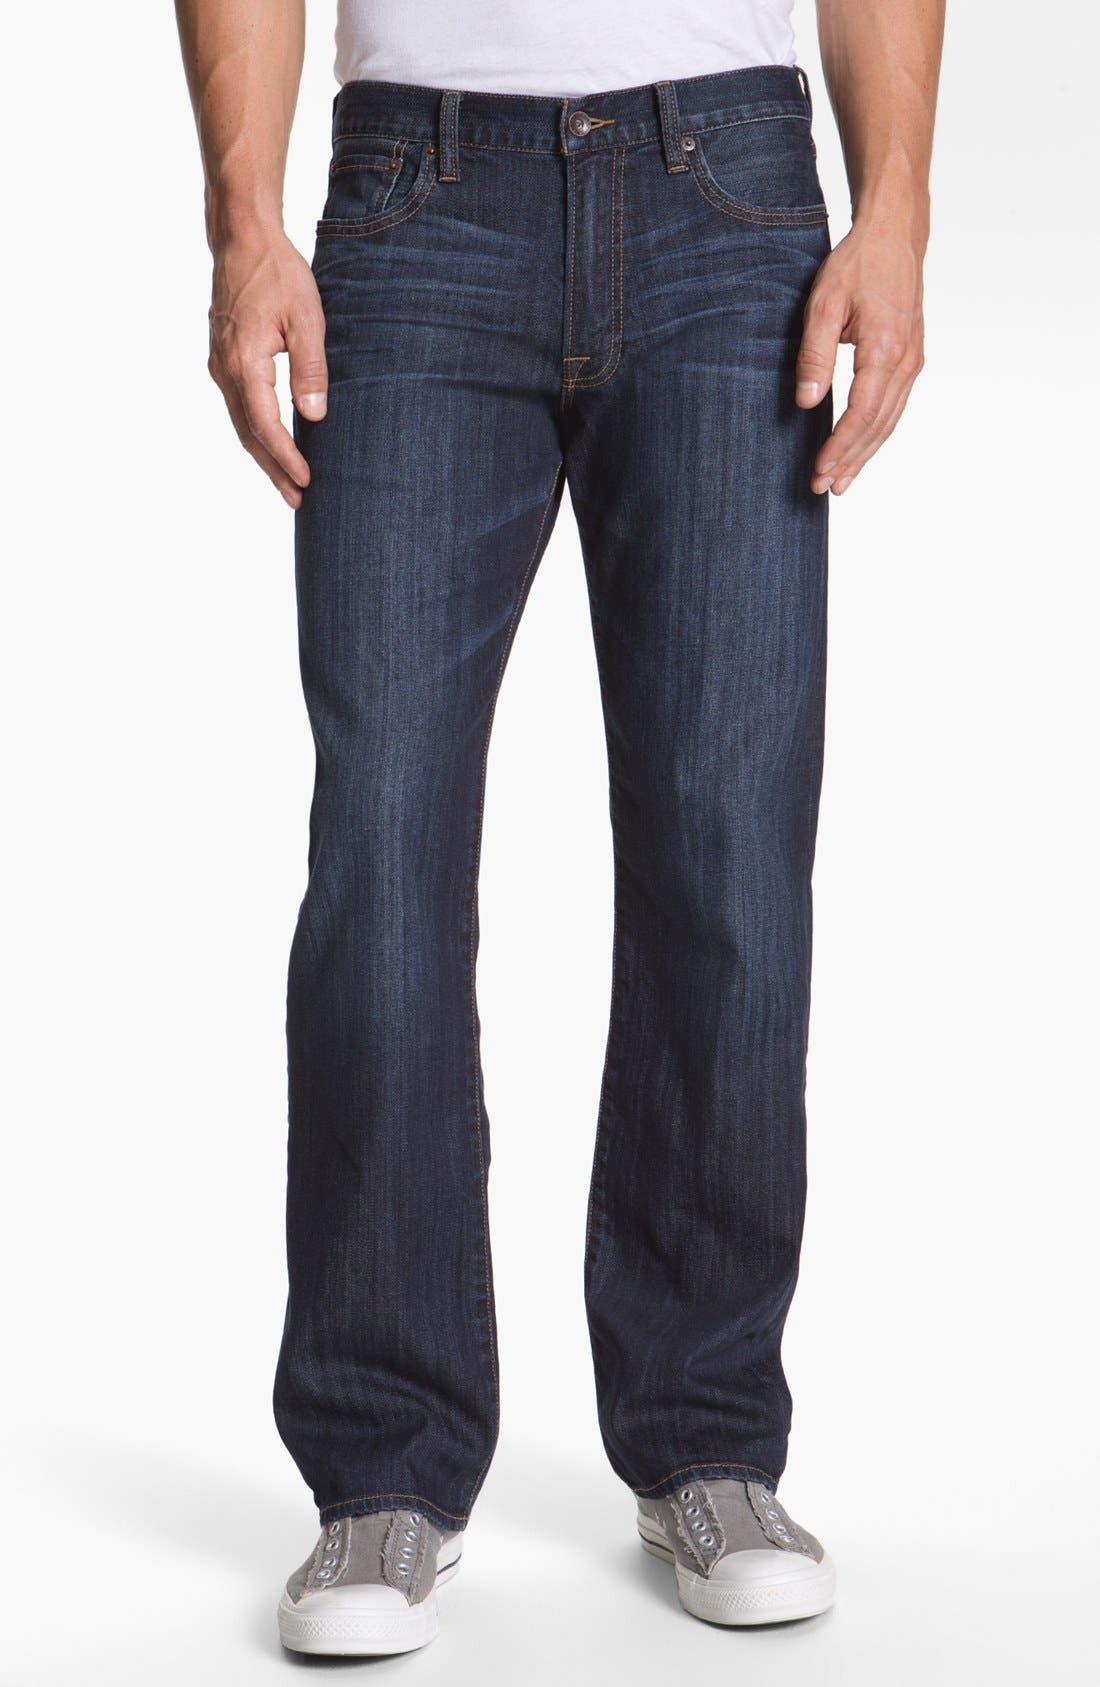 Main Image - Lucky Brand '361 Vintage' Straight Leg Jeans (Chanson)